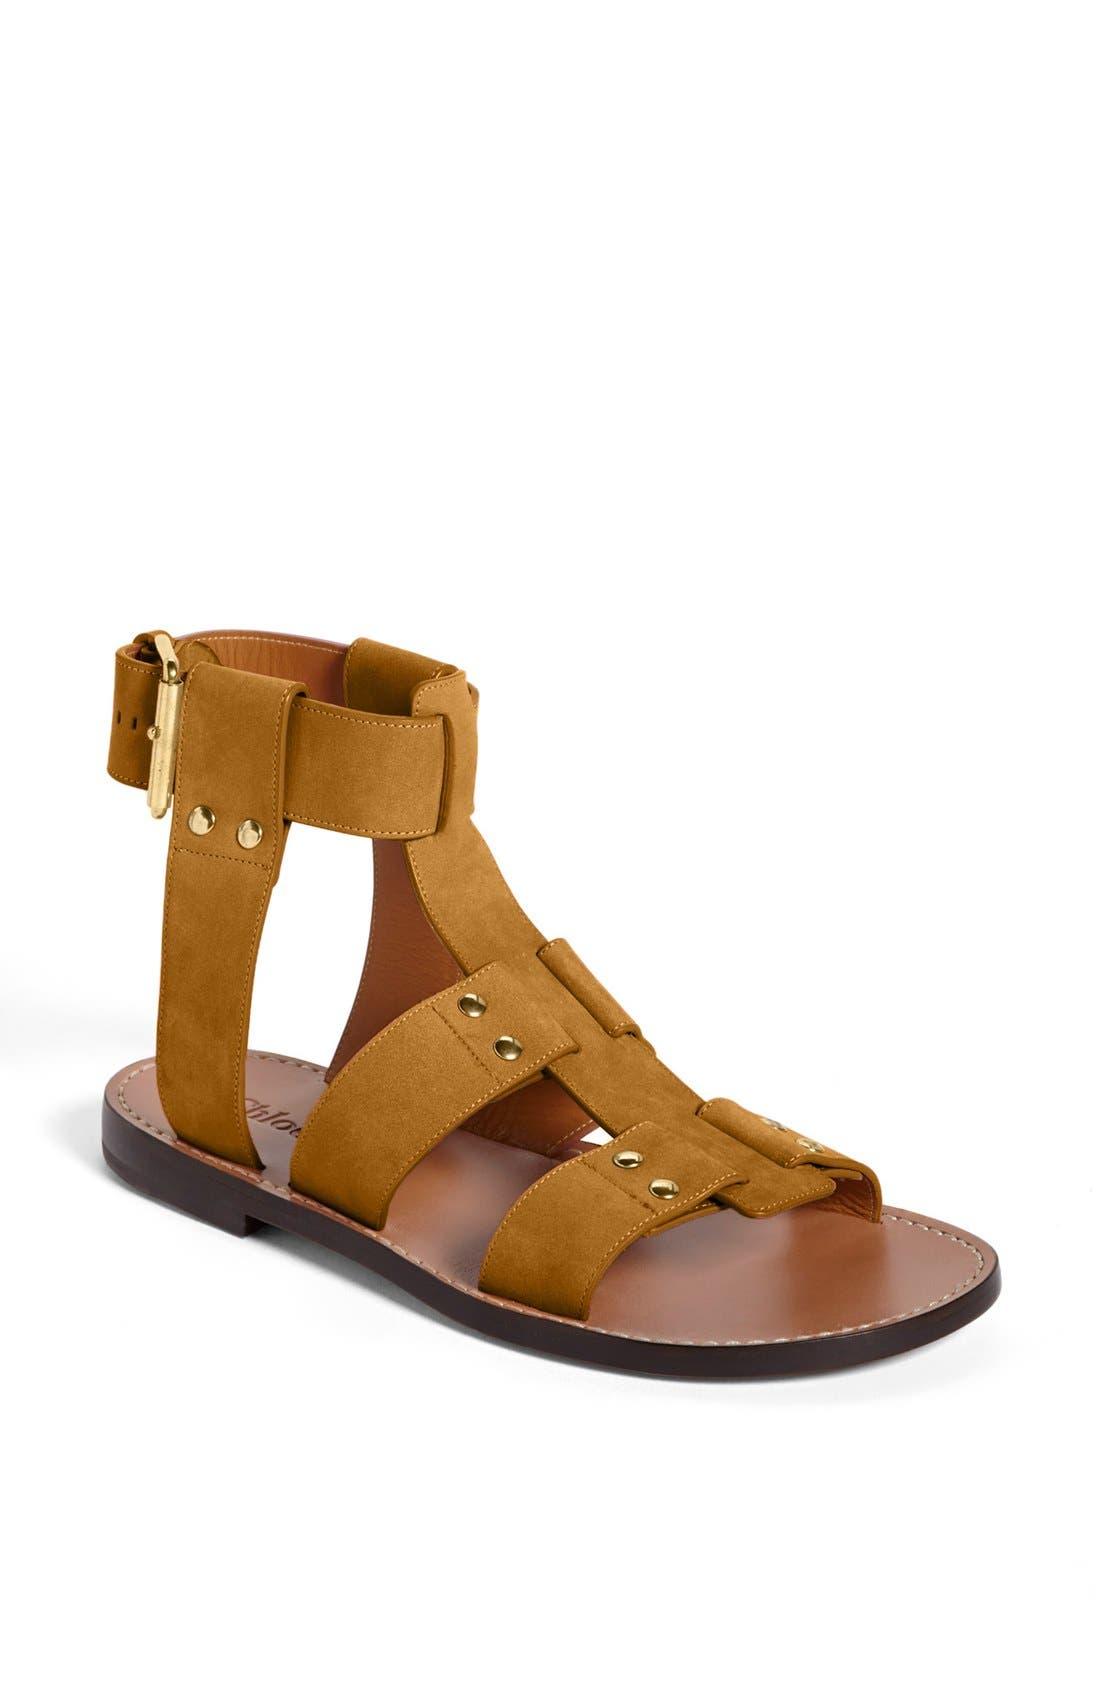 Alternate Image 1 Selected - Chloé 'Alaska' Flat Gladiator Sandal